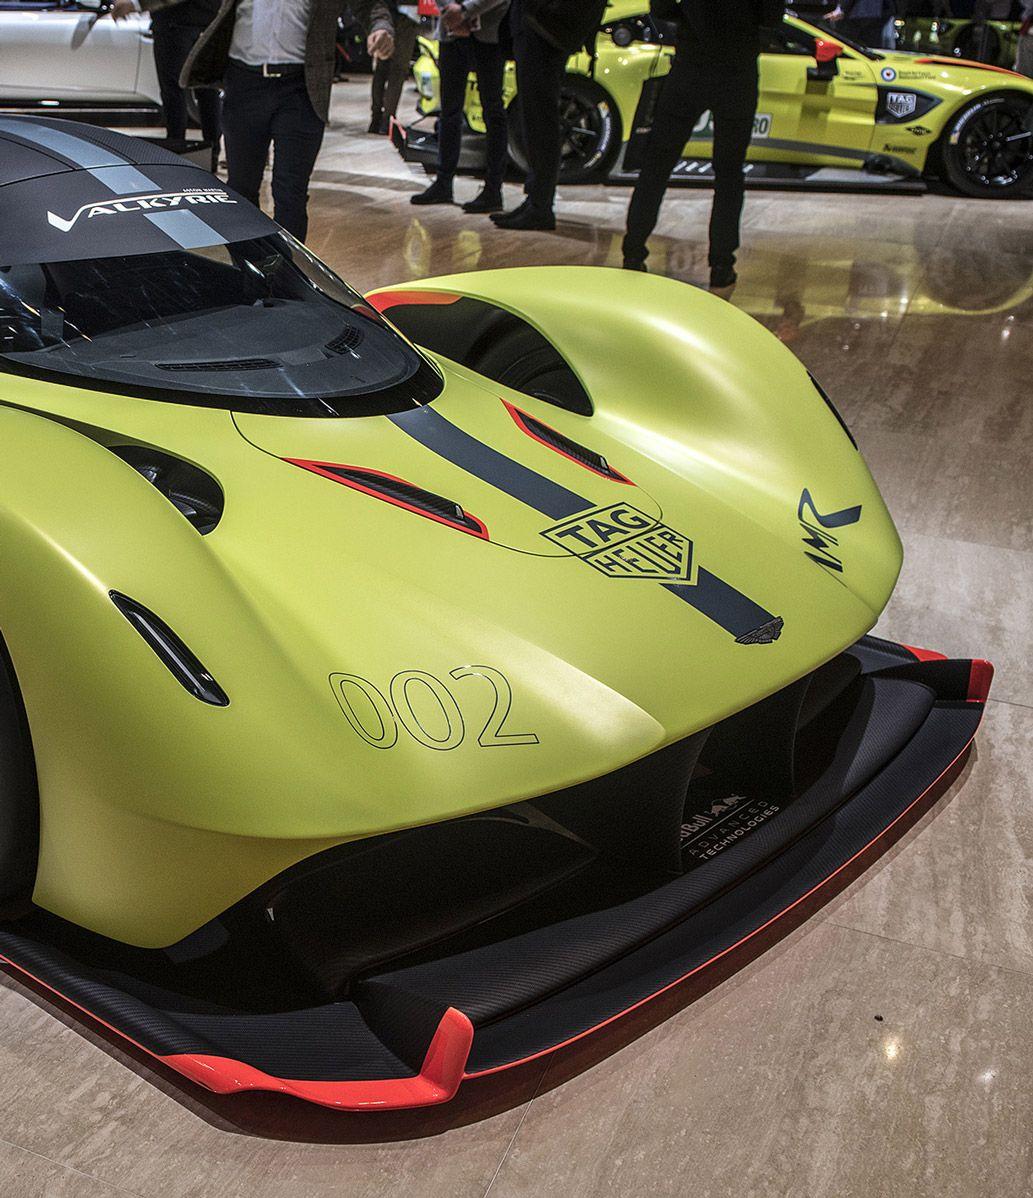 Aston Martin Valkyrie Sport: Aston-martin Valkyrie Geneva (With Images)